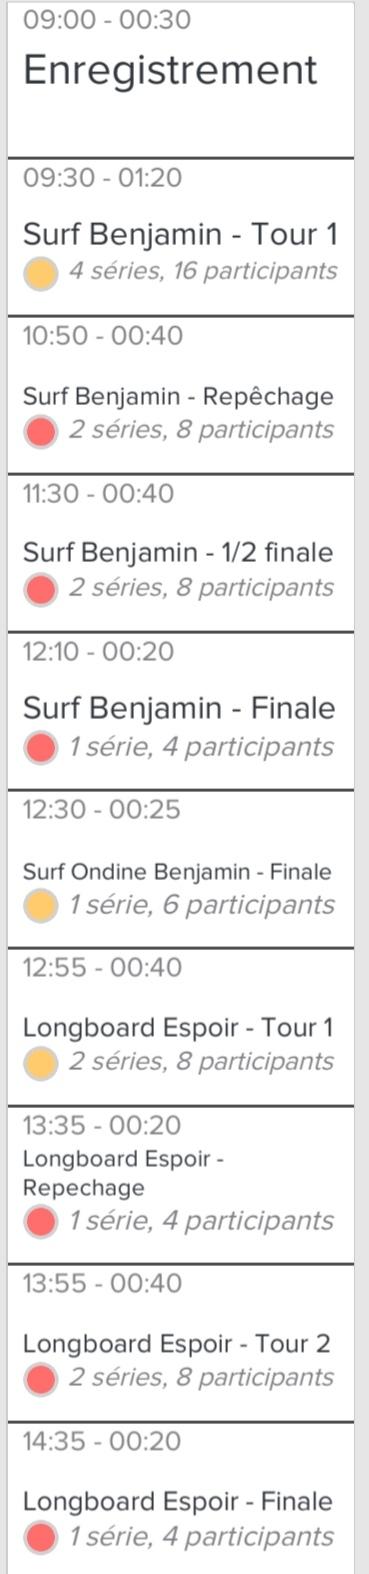 https://www.ligue-bretagne-surf.bzh/wp-content/uploads/2020/08/Screenshot_20200822_222448.jpg